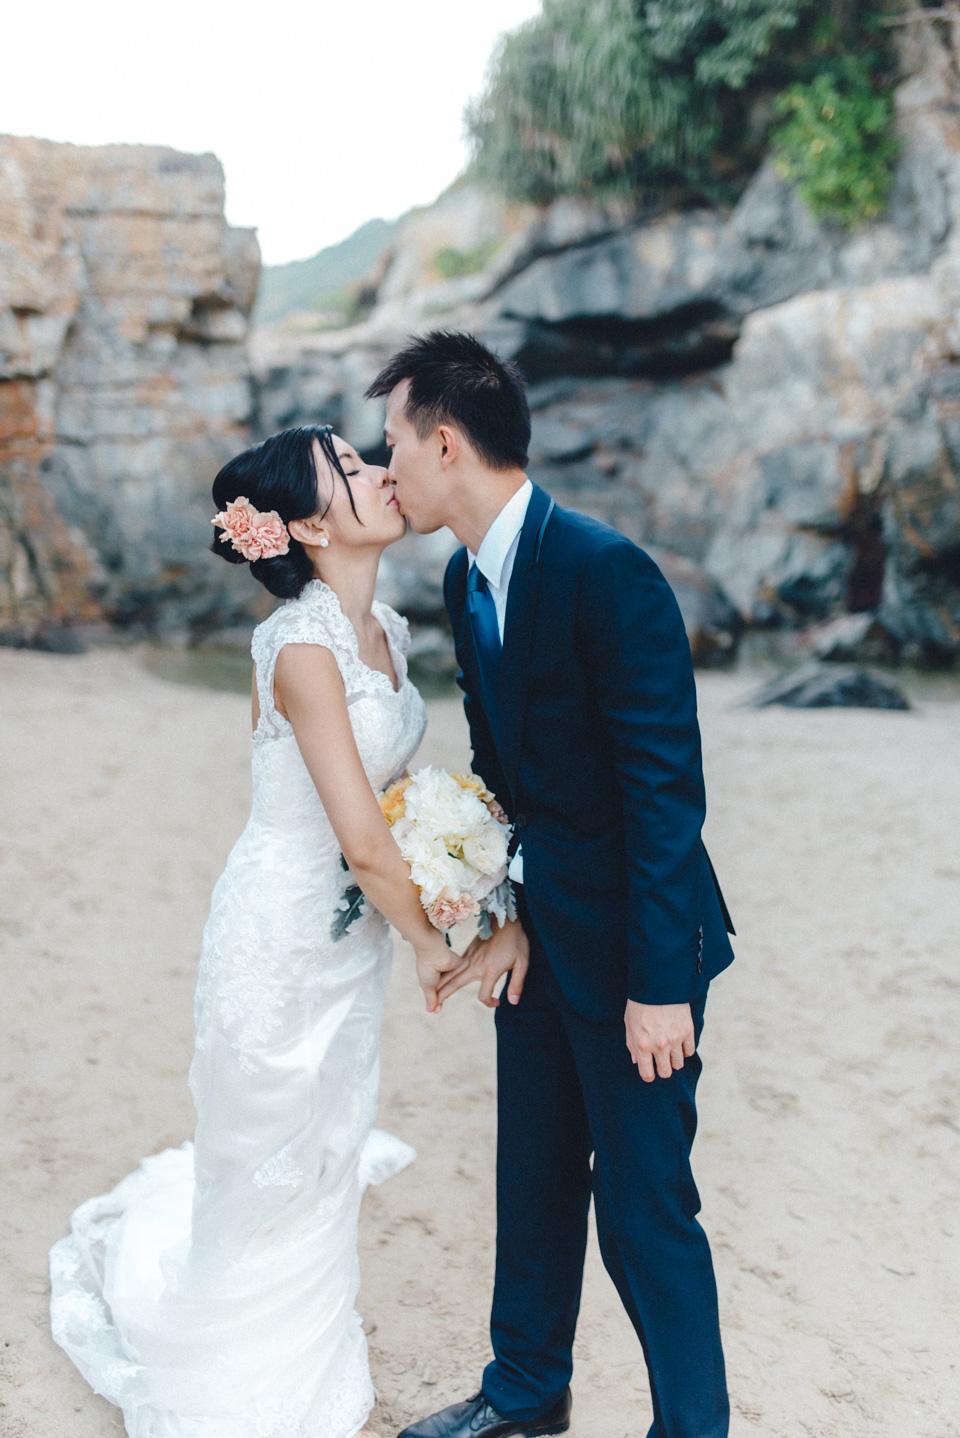 shooting-hongkong-beach-22 After Weddingshoot in HongKongshooting hongkong beach 22